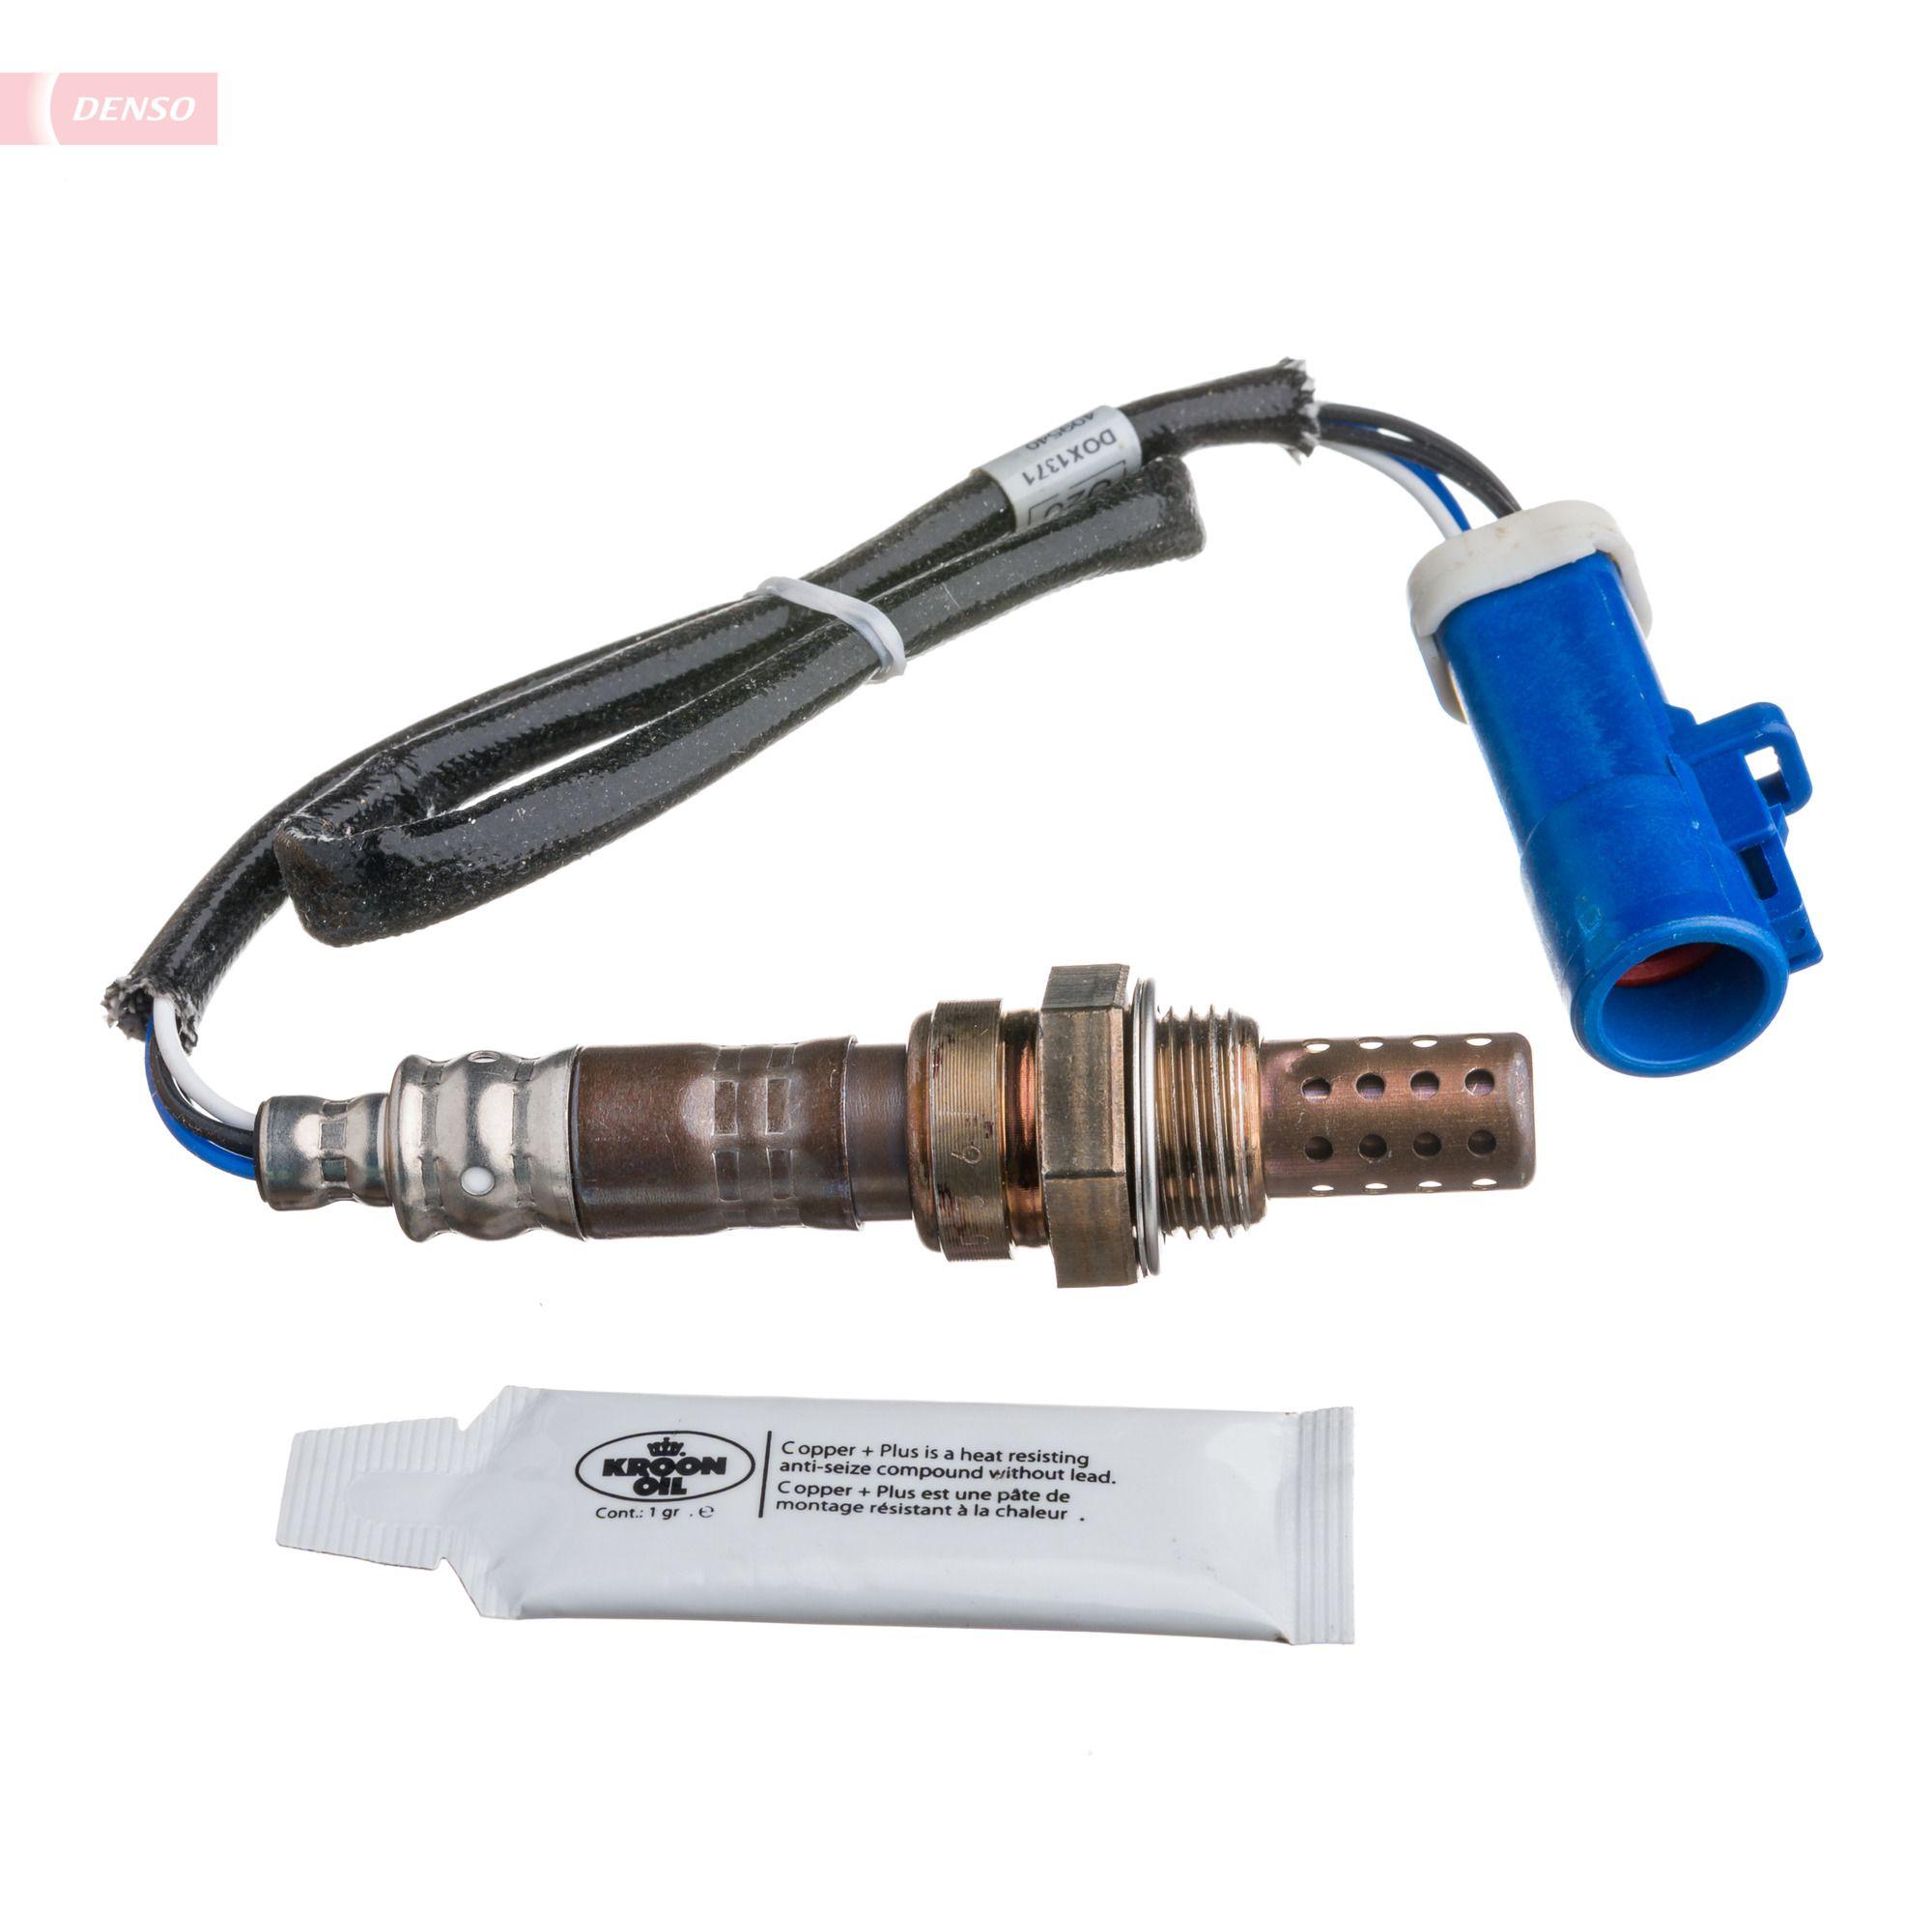 DOX-1371 DENSO van de fabrikant tot - 30% korting!